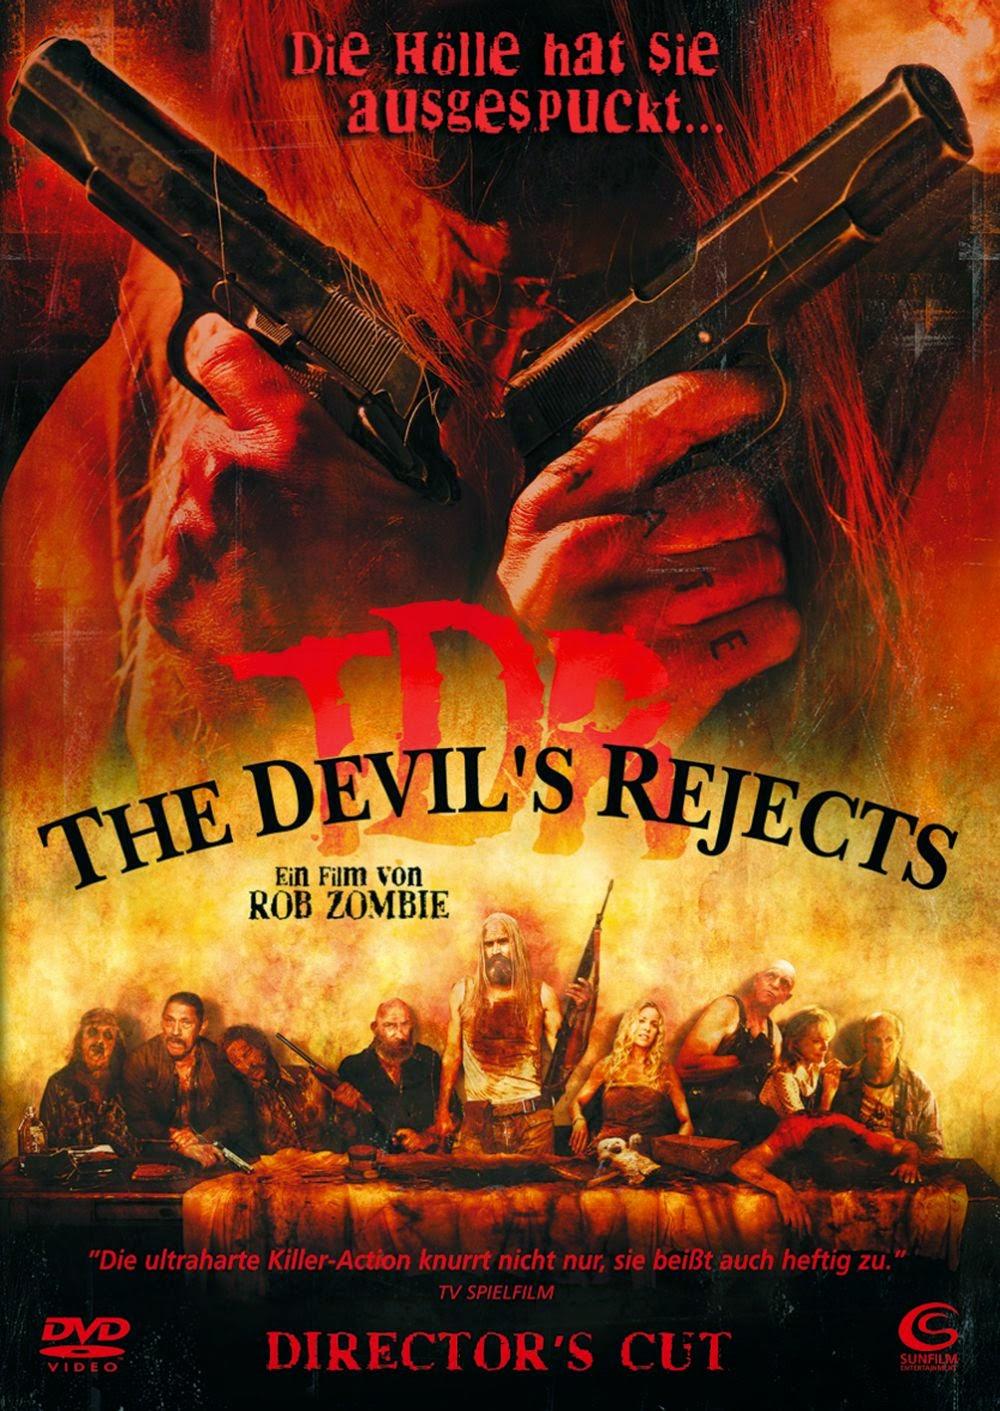 The Devil's Rejects เกมล่าล้างคนพันธุ์นรก [HD][พากย์ไทย]